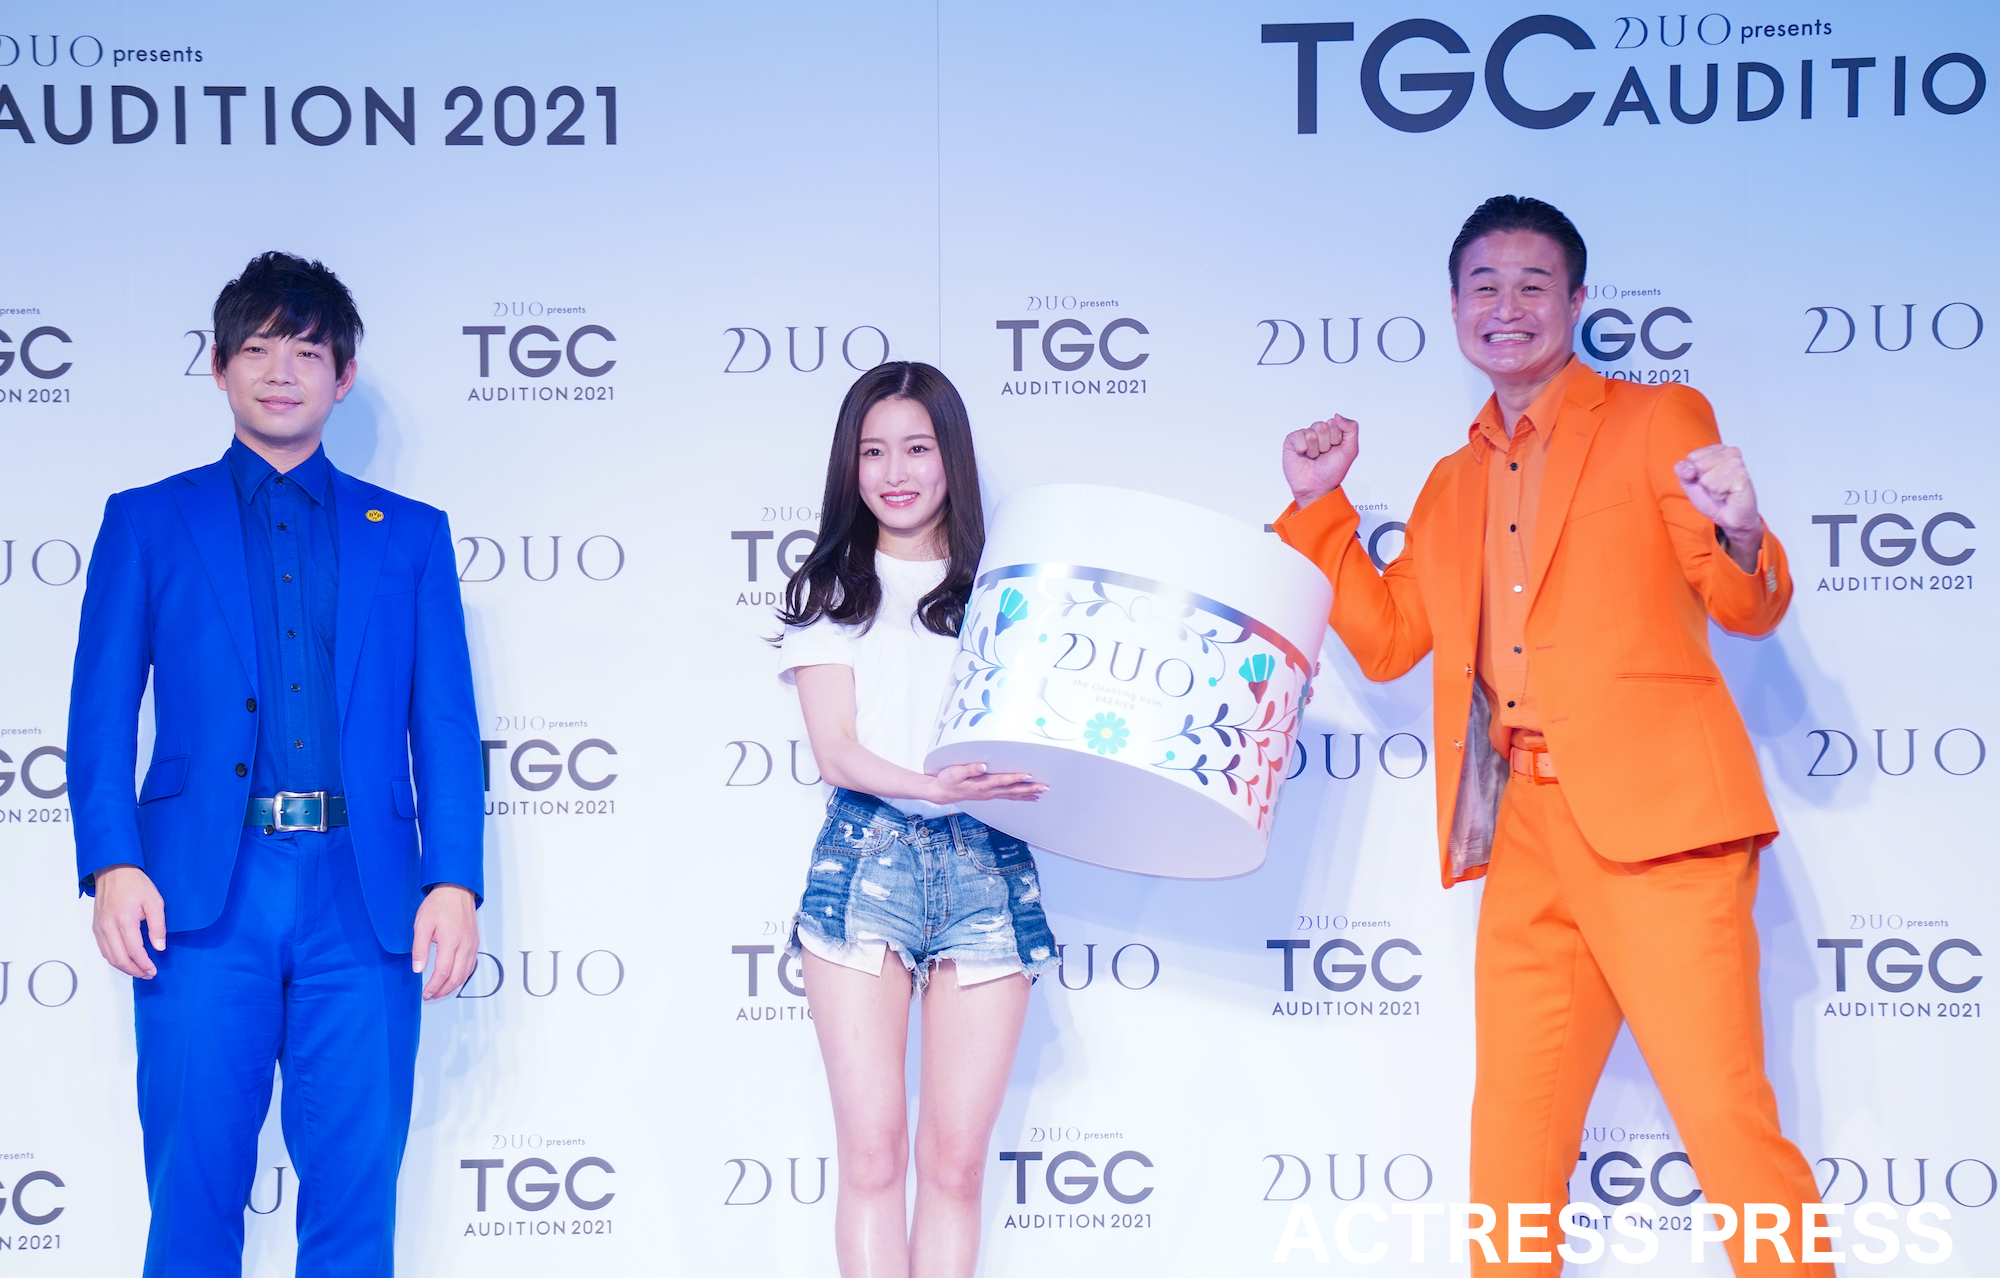 新山桃子「TGC AUDITION 2021」DUO賞(2021年4月18日、撮影:ACTRESS PRESS編集部)